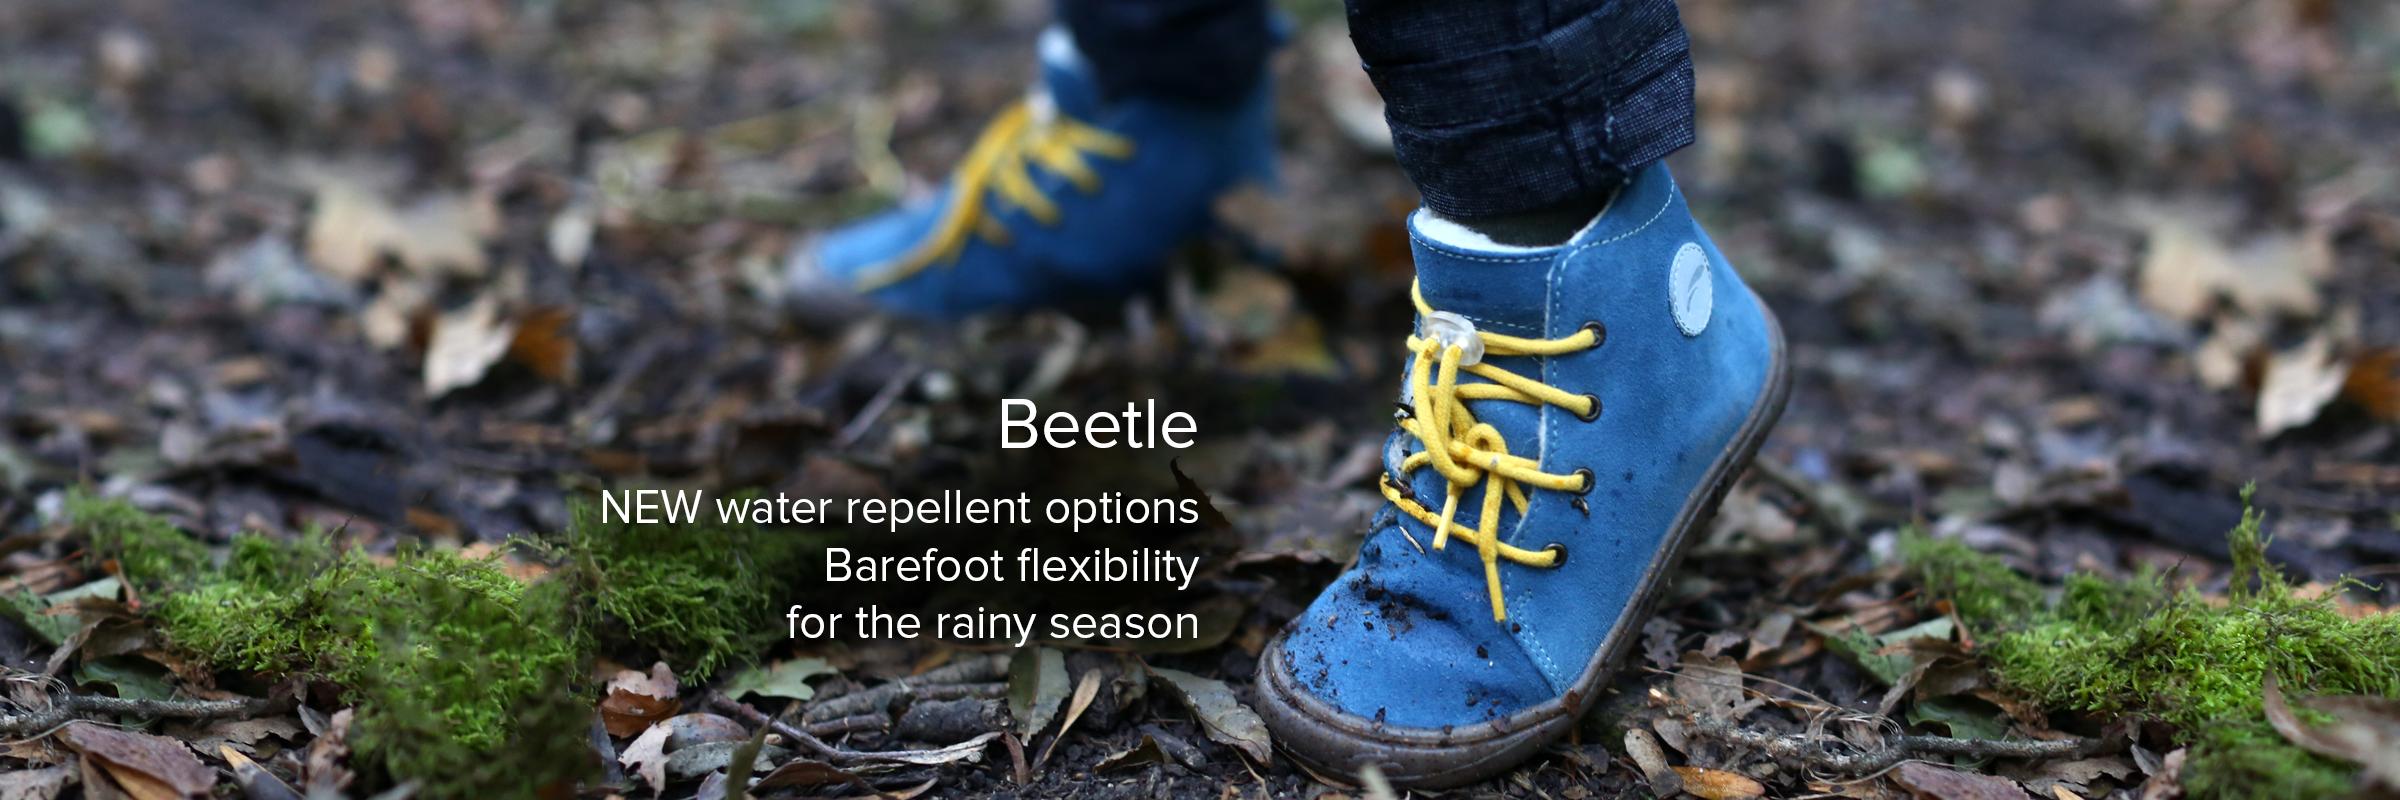 Beetle ENG